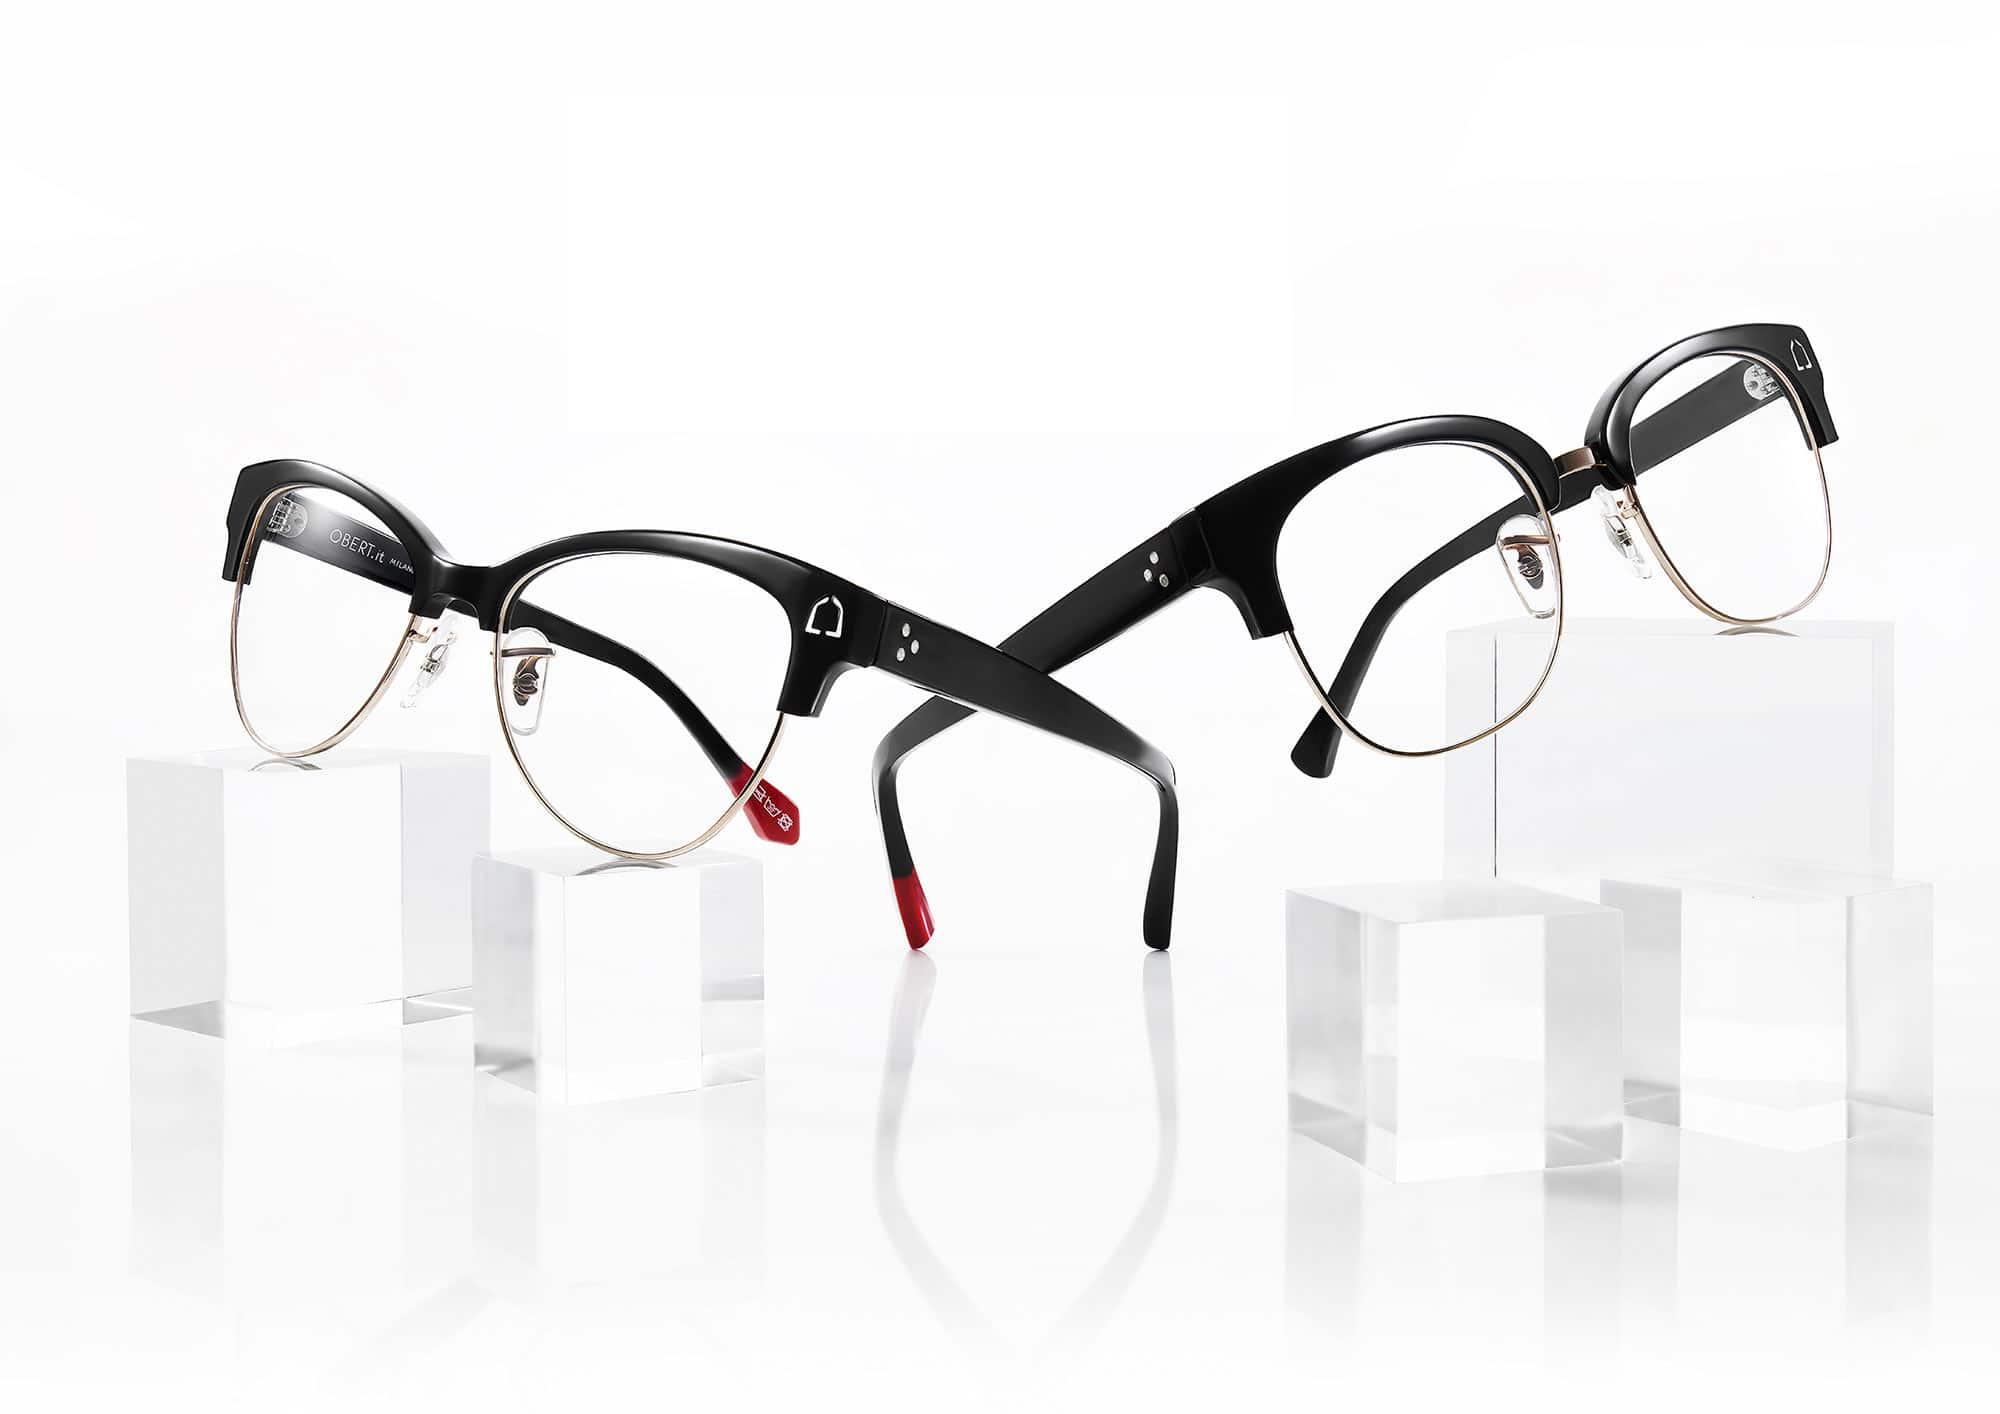 Black Glasses Still Life Shot for Obert by Fotografando